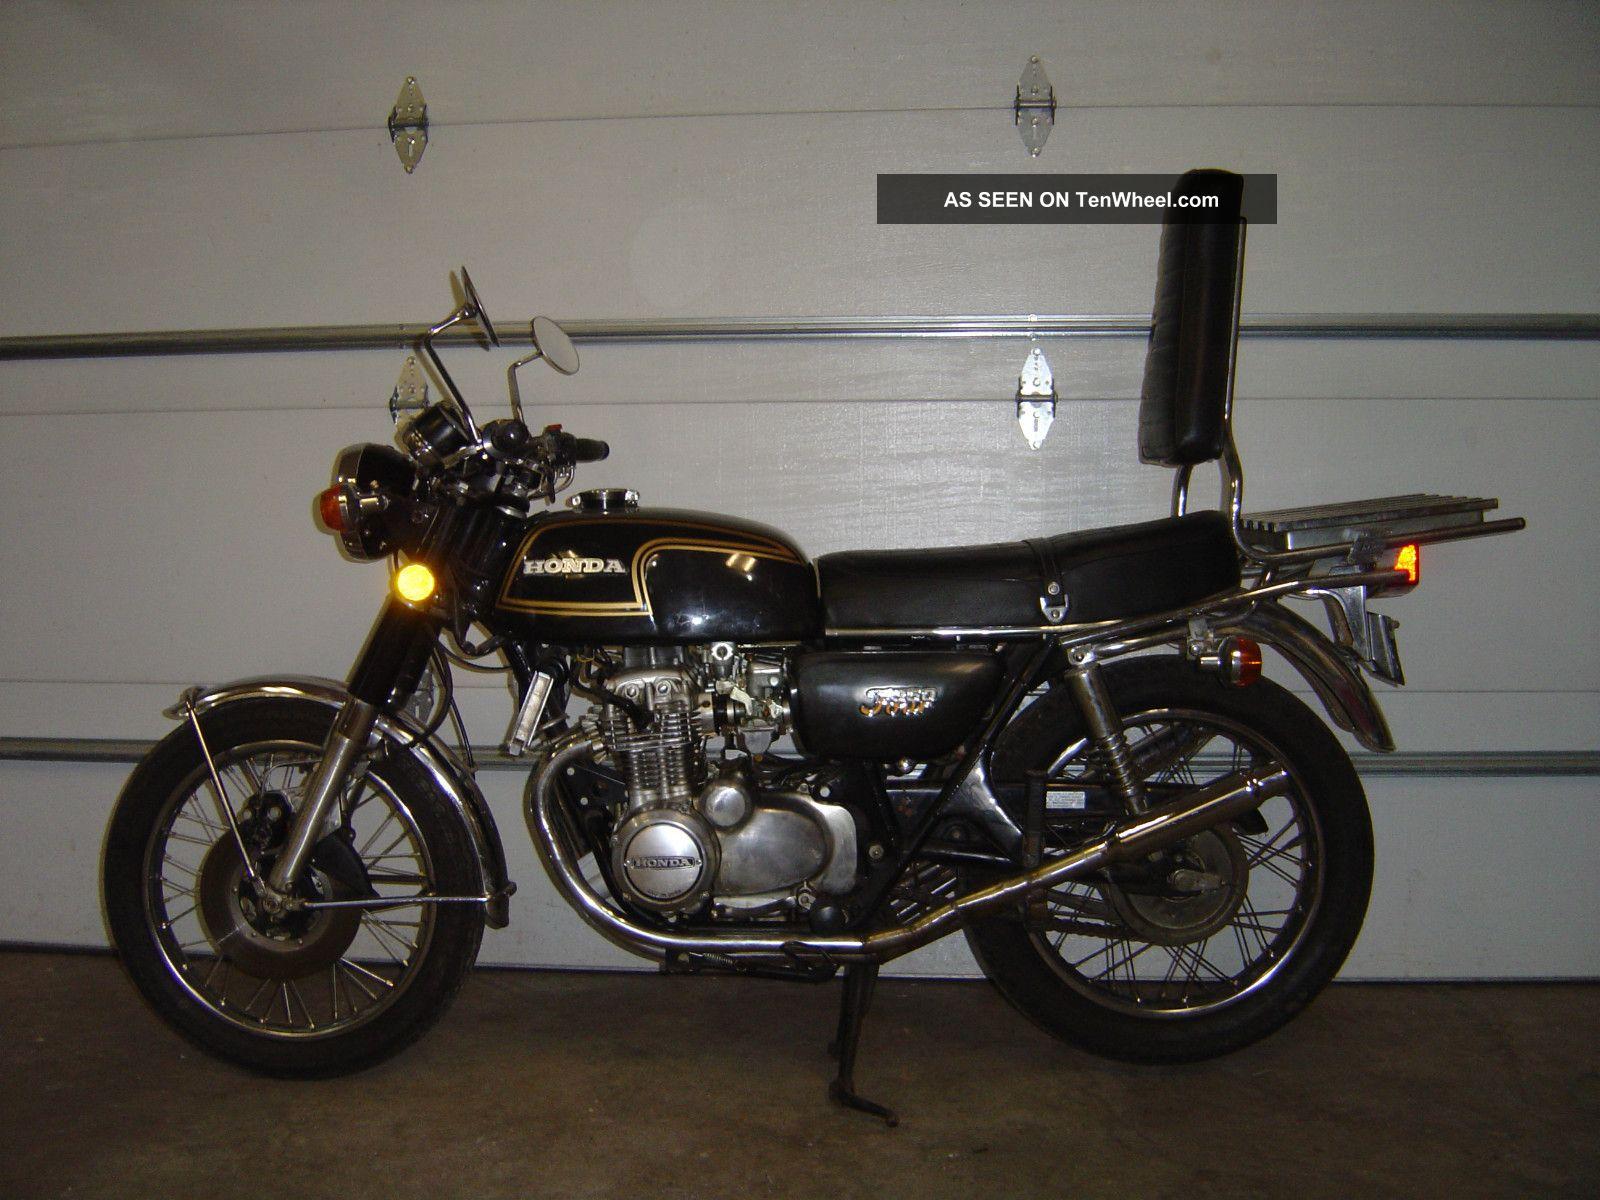 1974 Honda Cb 350 F Cb350f Cb350 350f Four Vintage Running Great Shape No Res CB photo